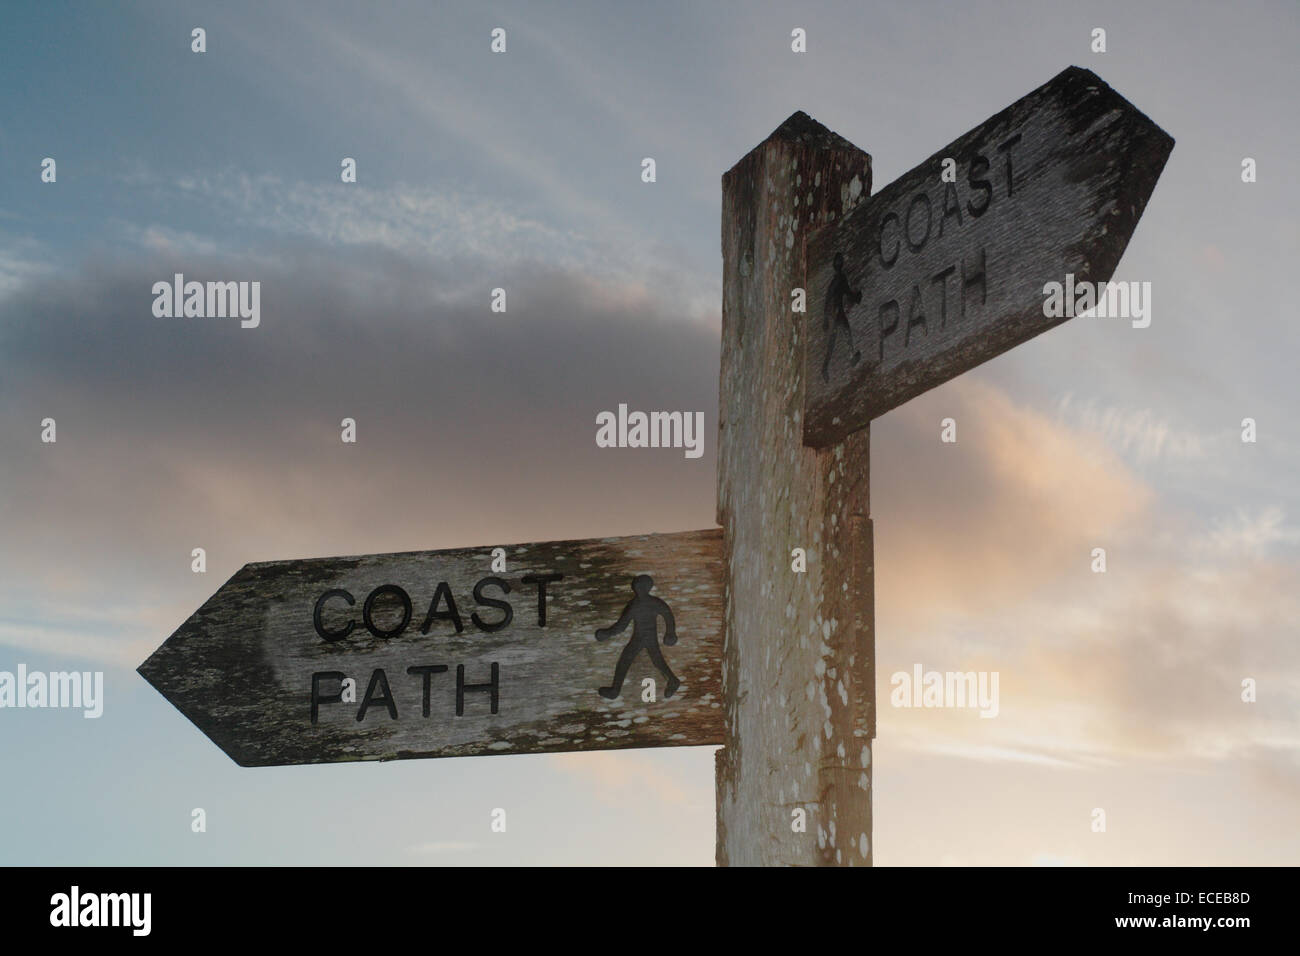 Großbritannien, England, Dorset, Coast Path, Küste Weg Finger post Stockbild